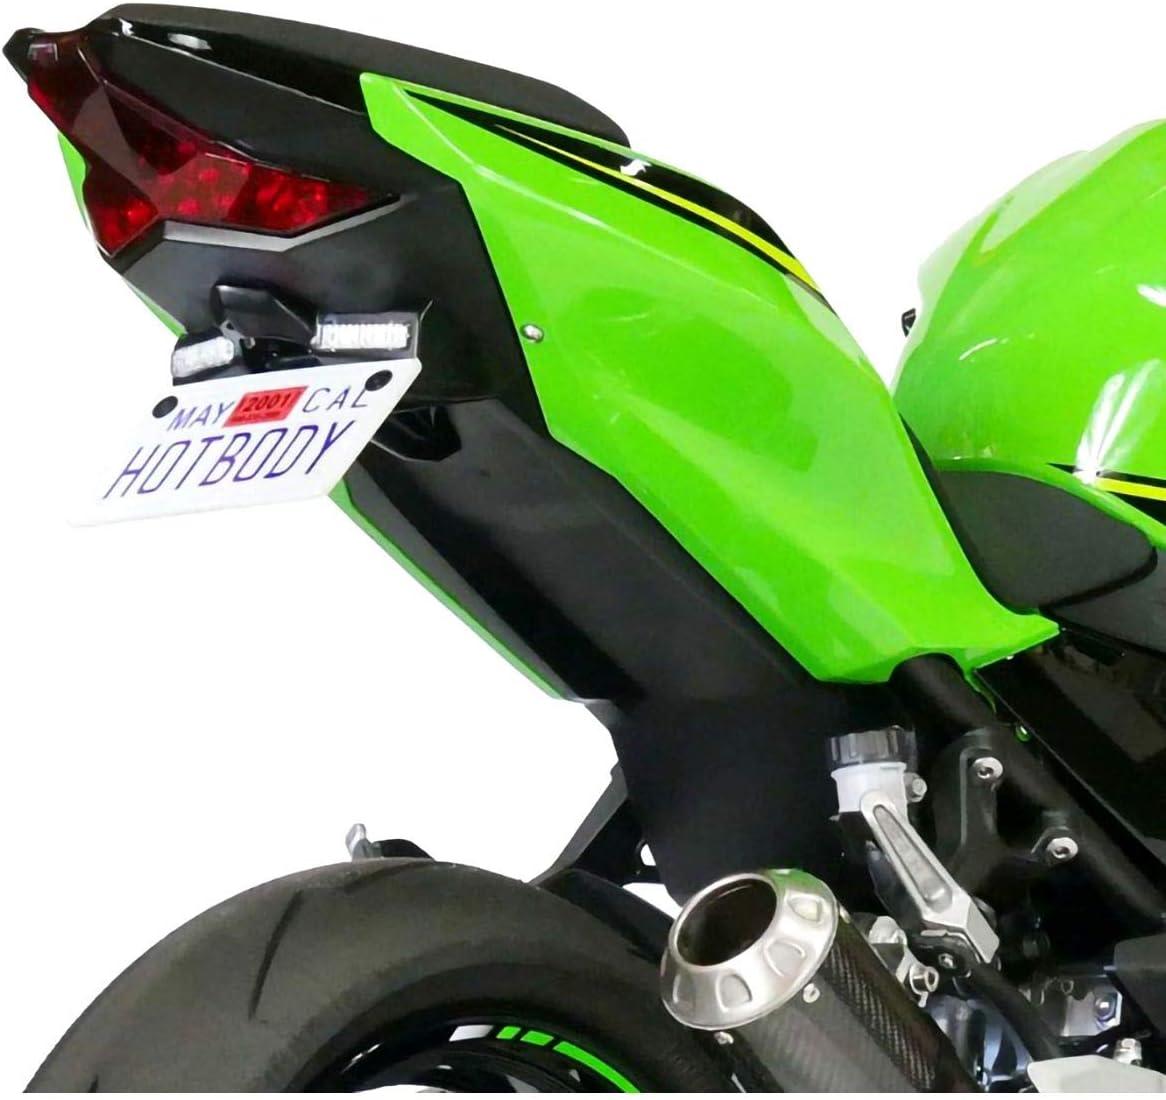 Hotbodies Racing 18-19 Kawasaki EX400ABS TAG Fender Eliminator Kit